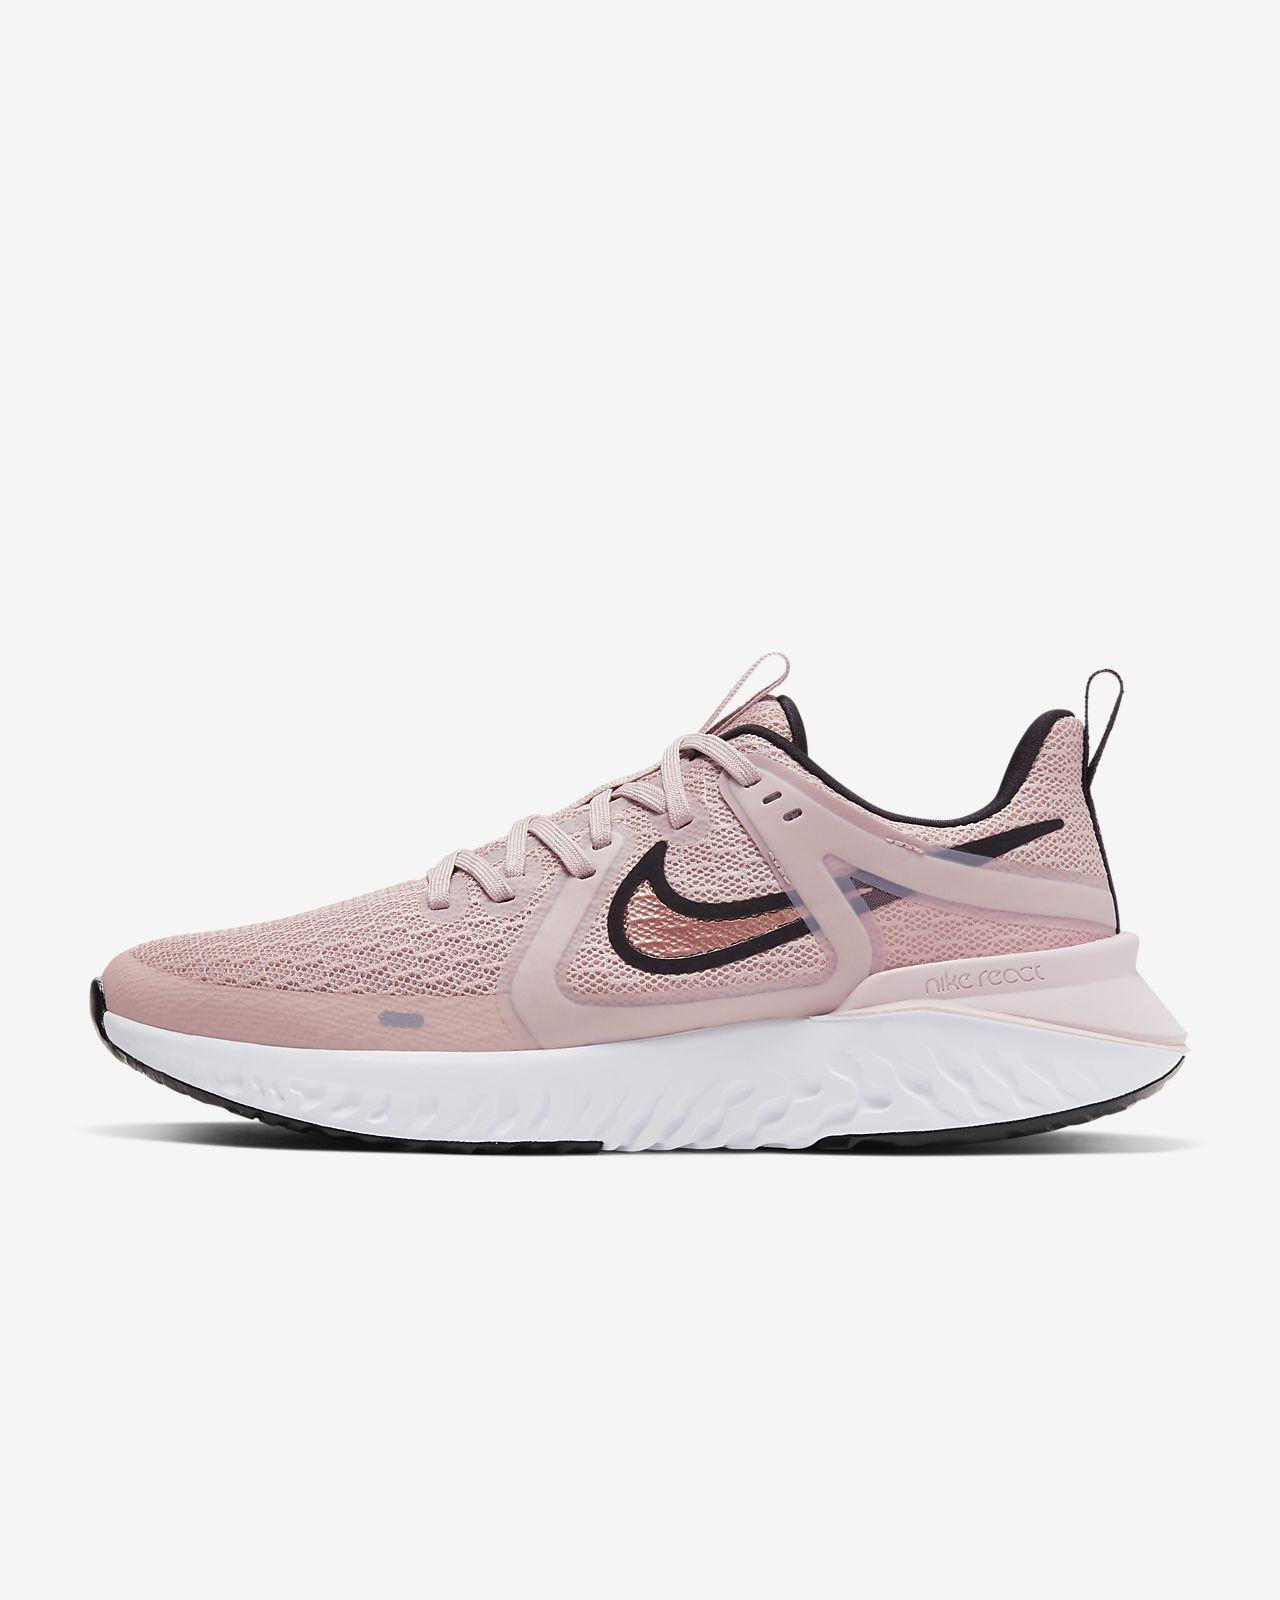 Sapatilhas de running Nike Legend React 2 para mulher